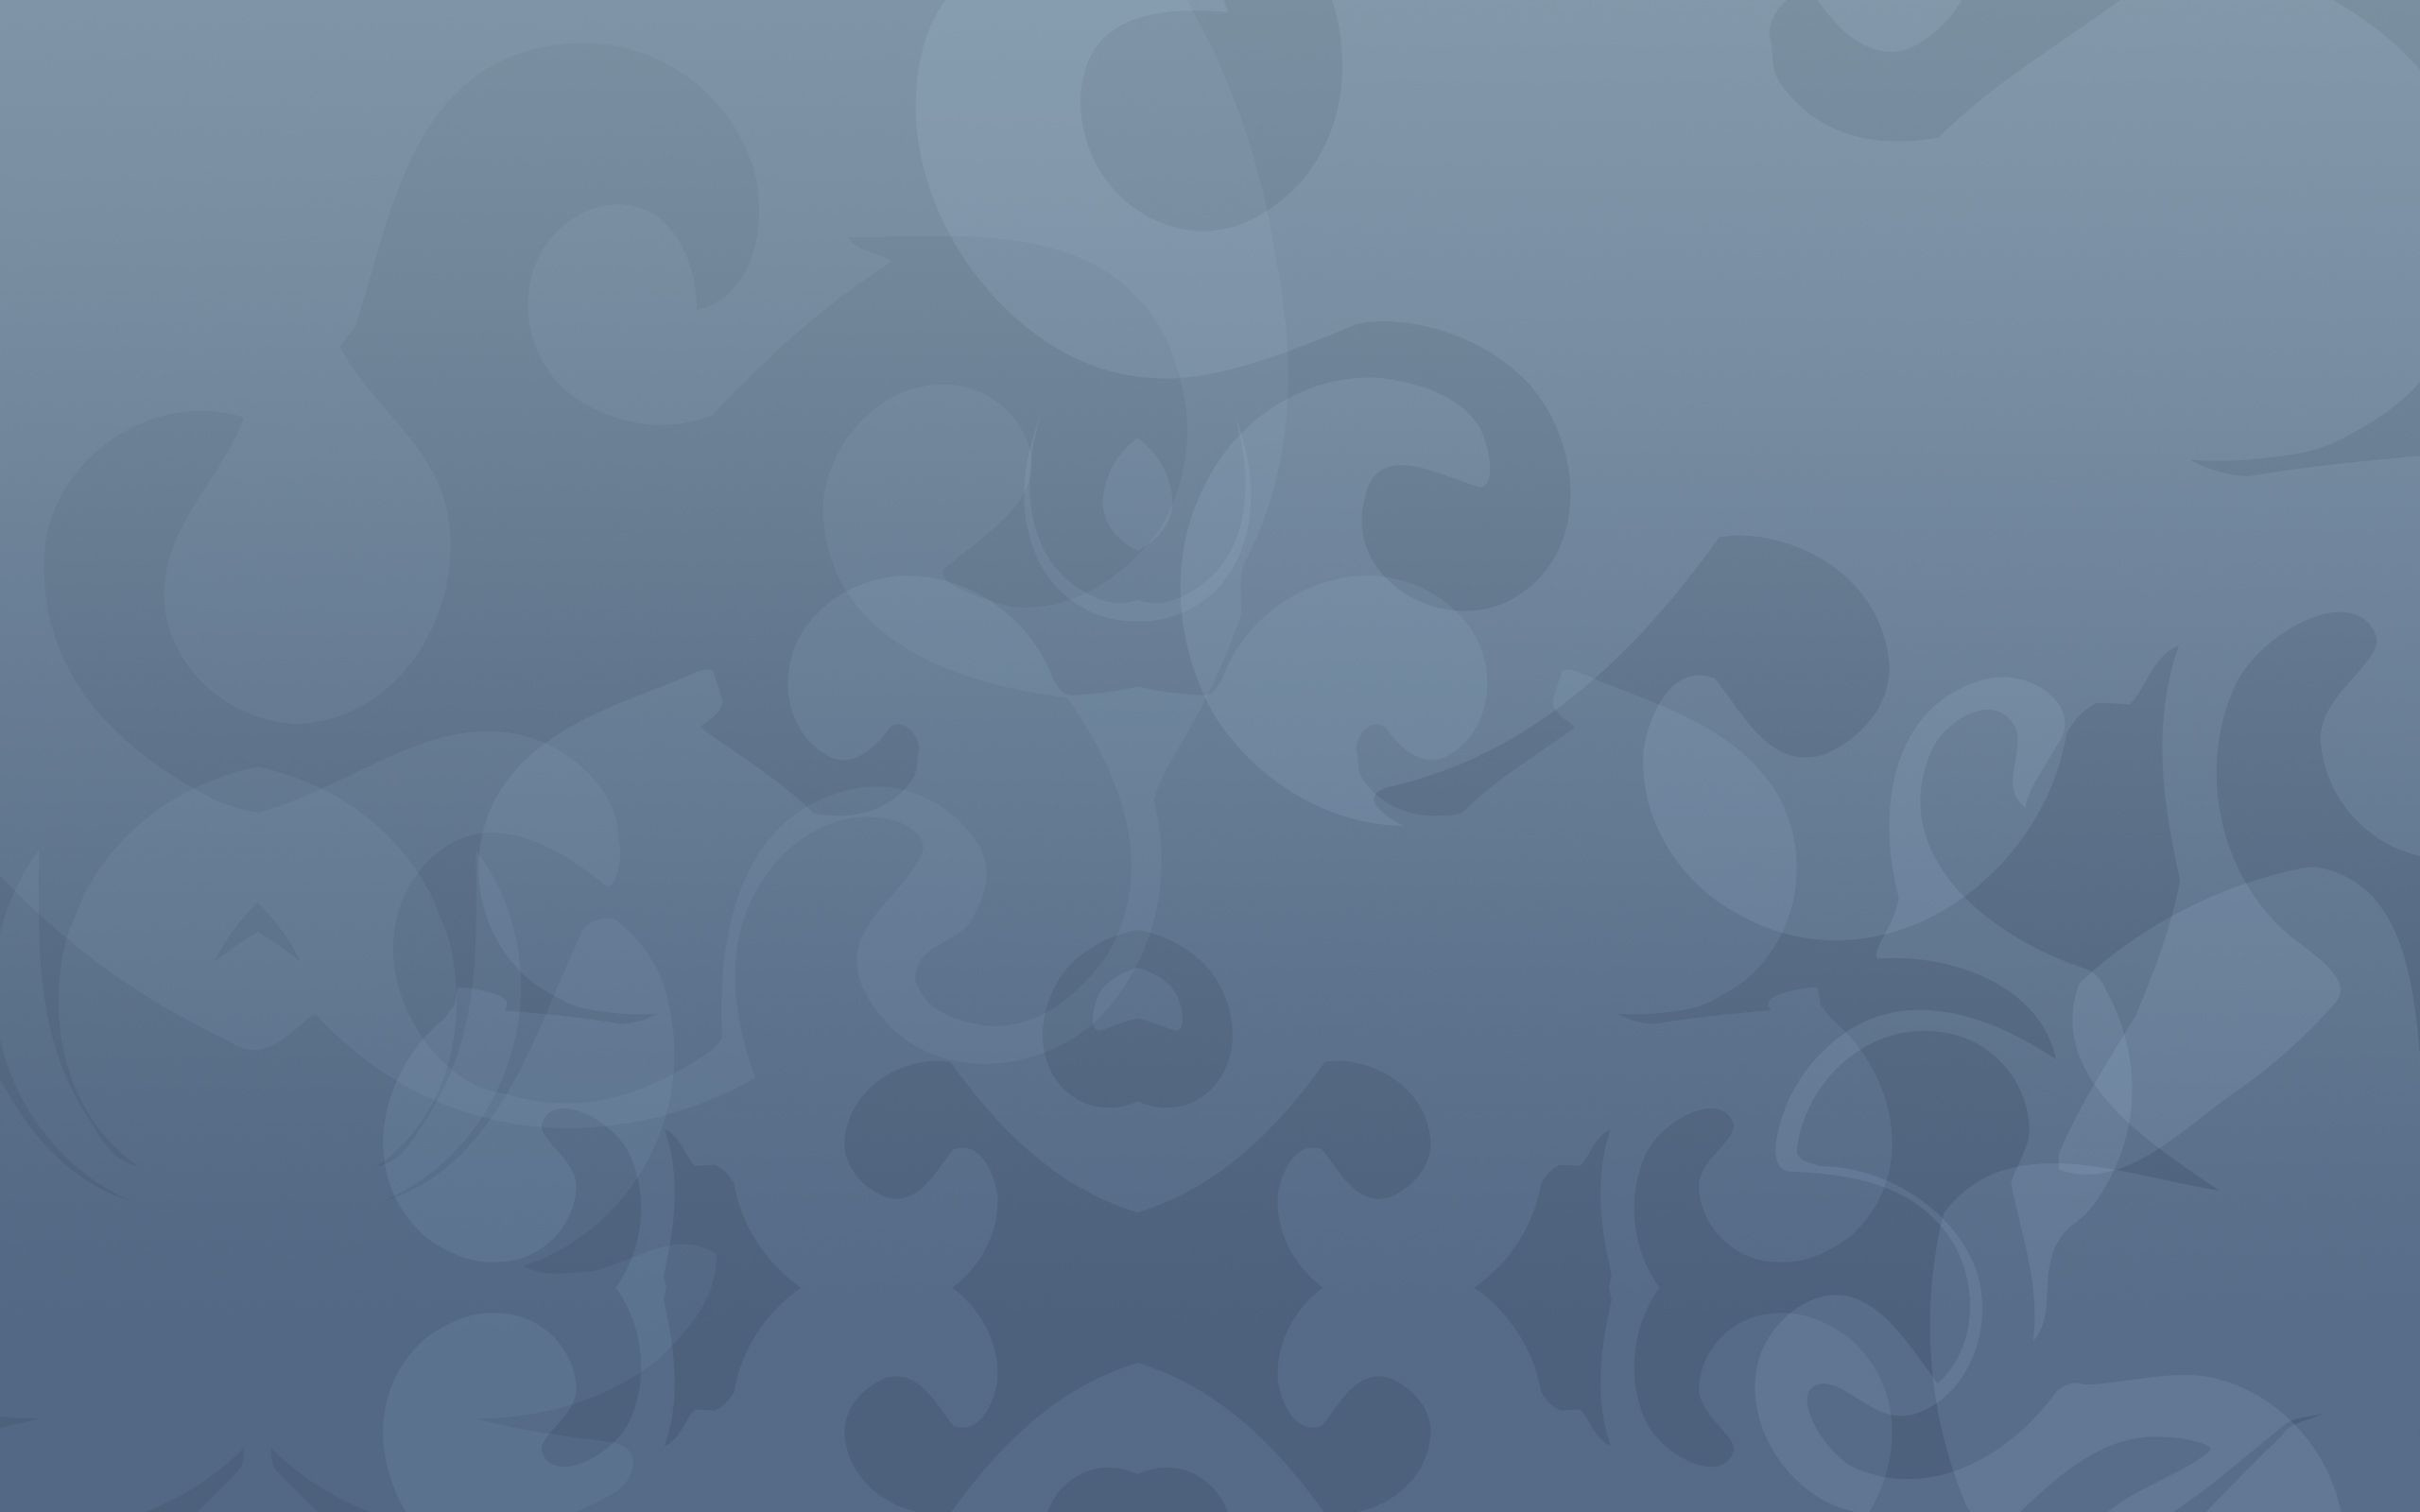 grey-blue-abstract-wallpaper.jpg